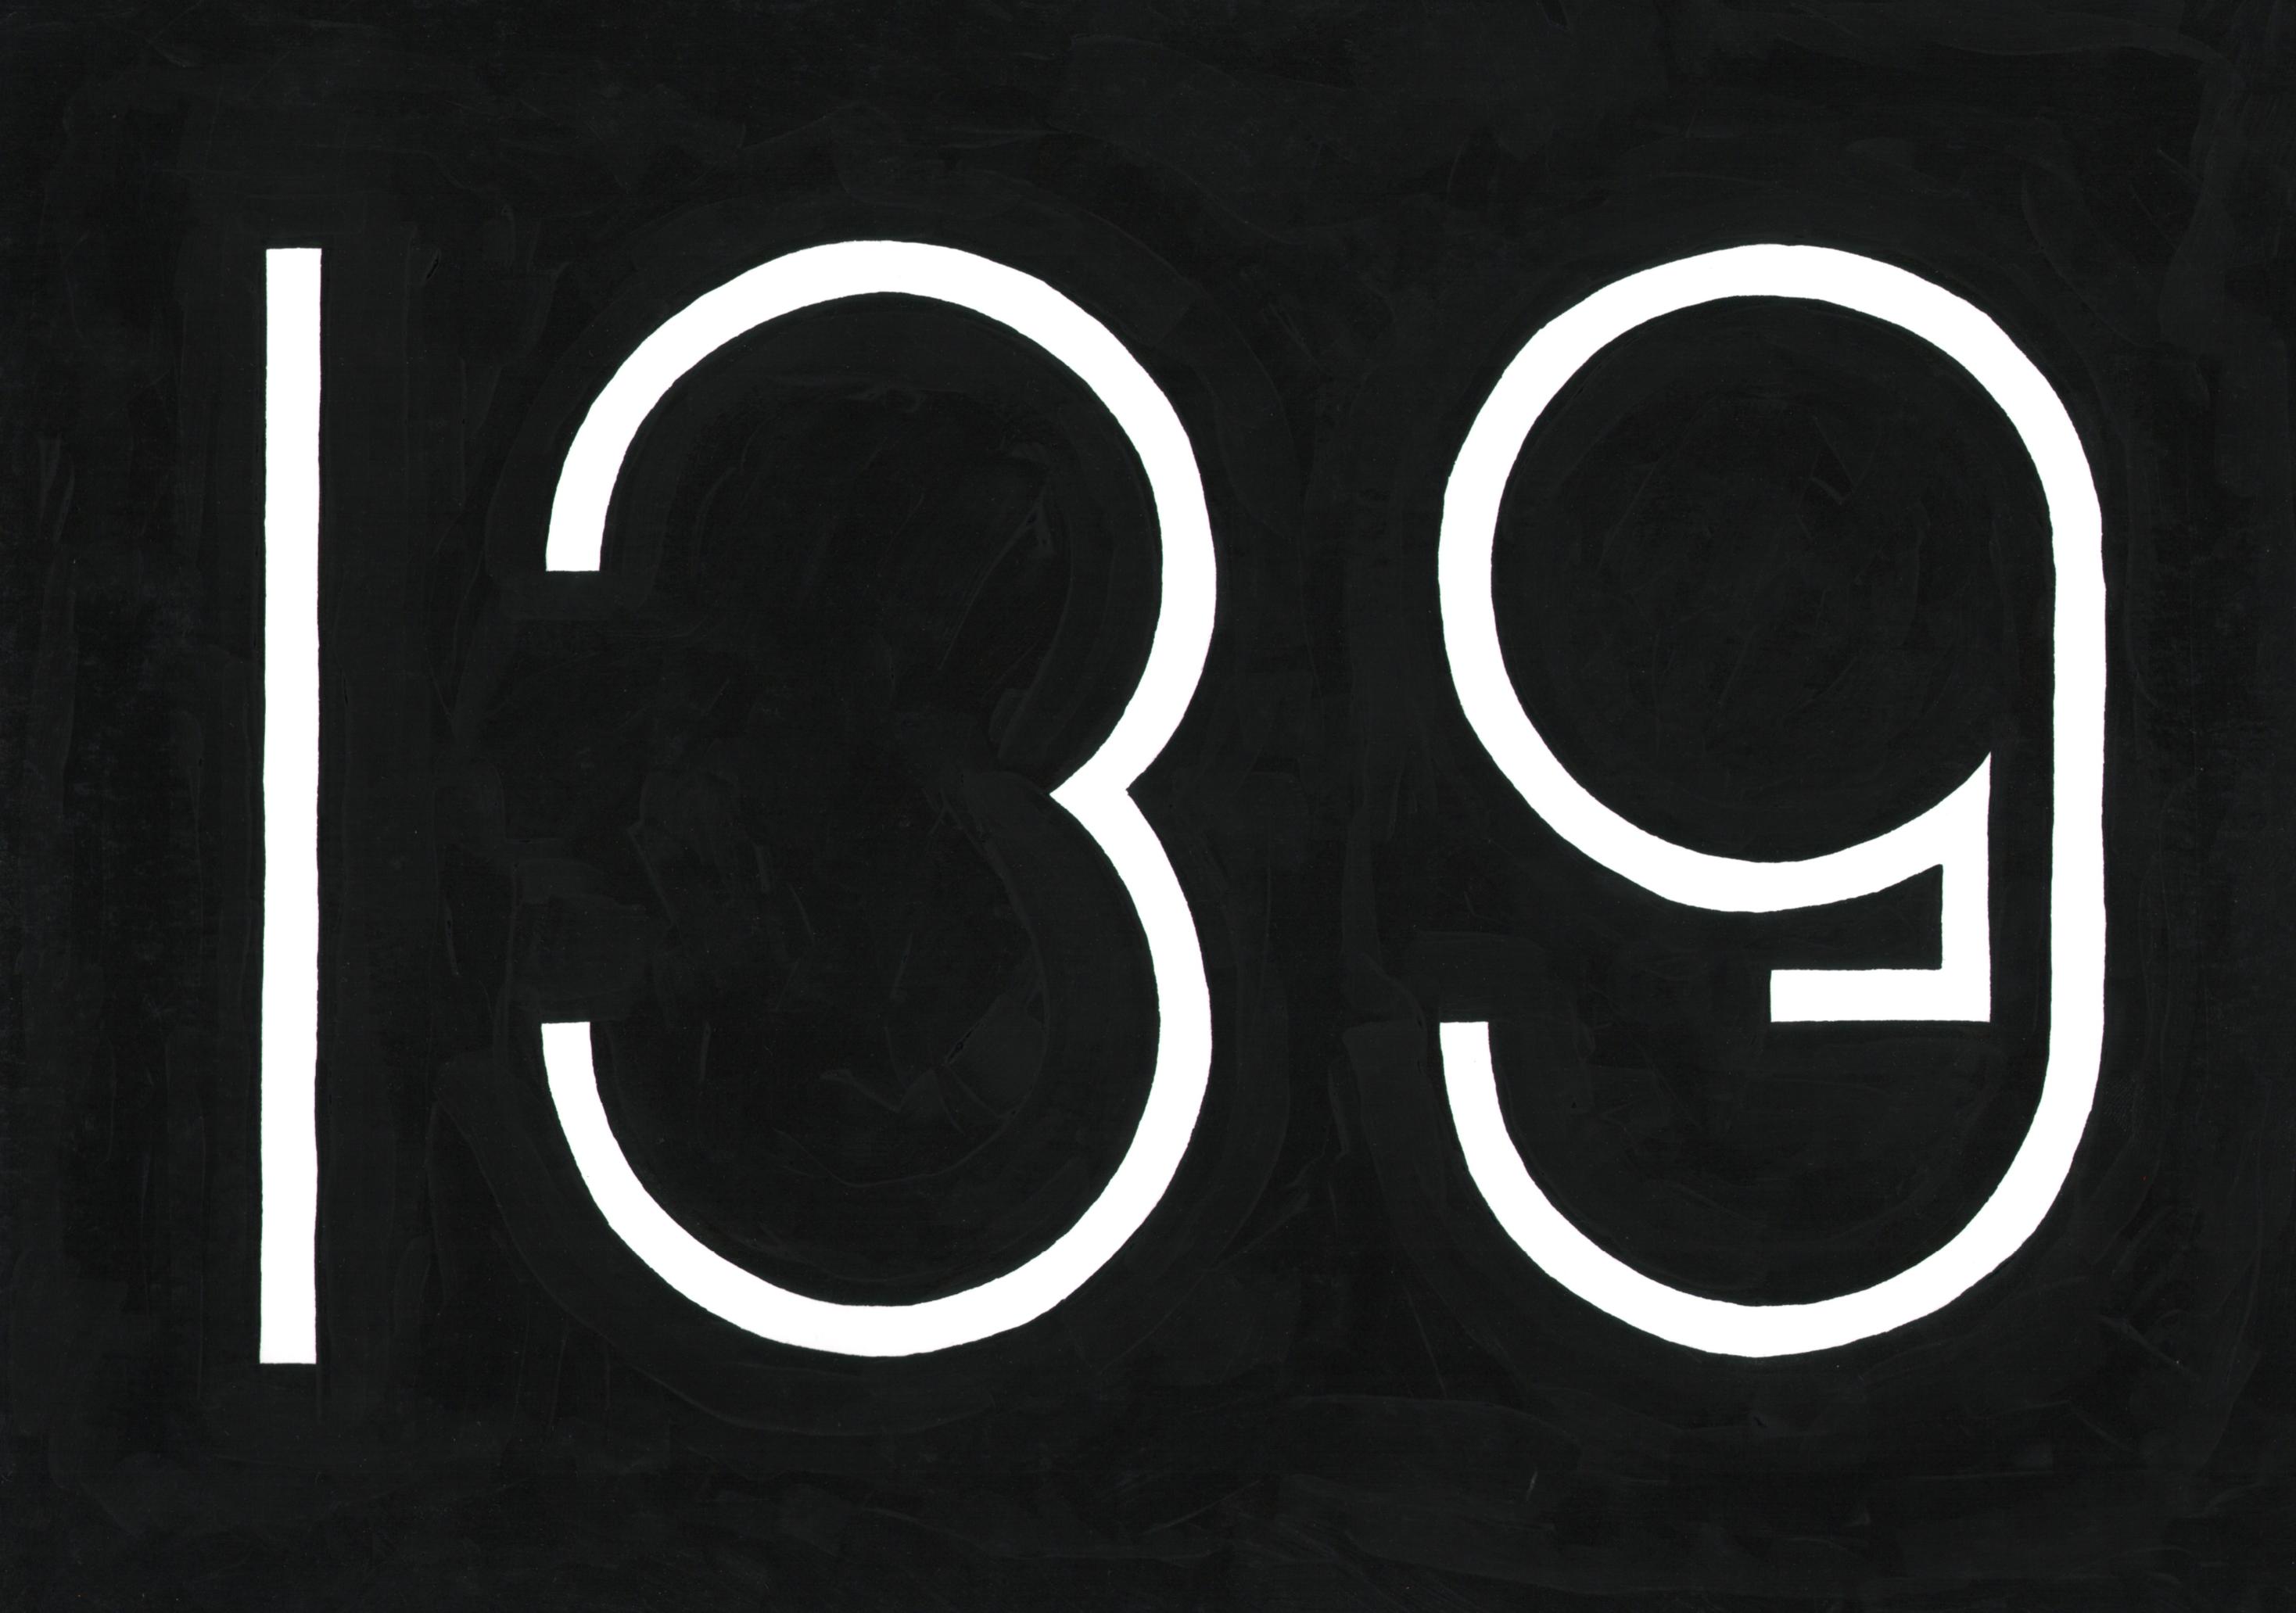 Число 135